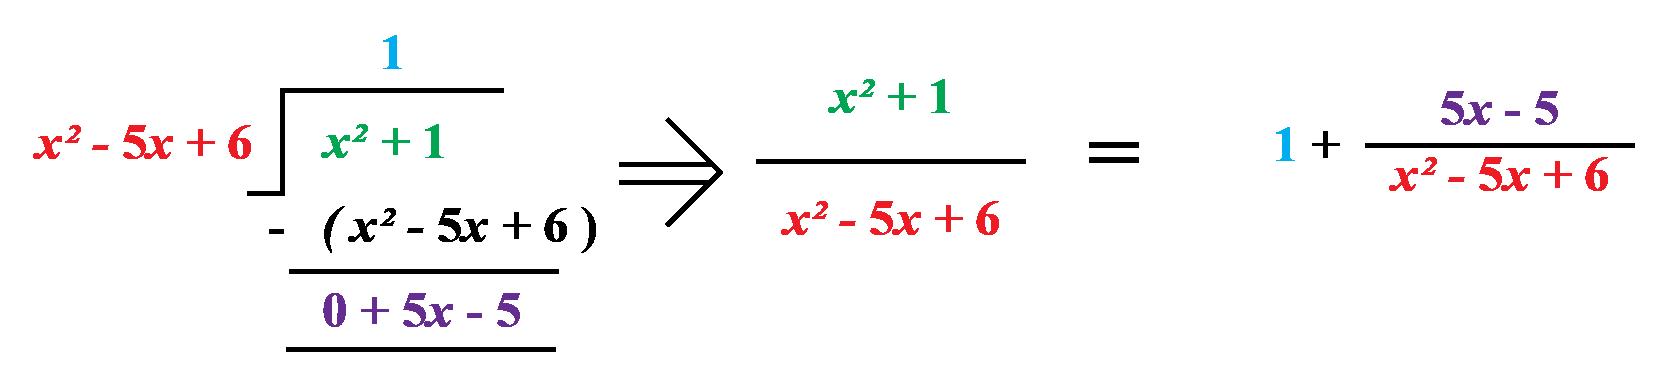 Long division method